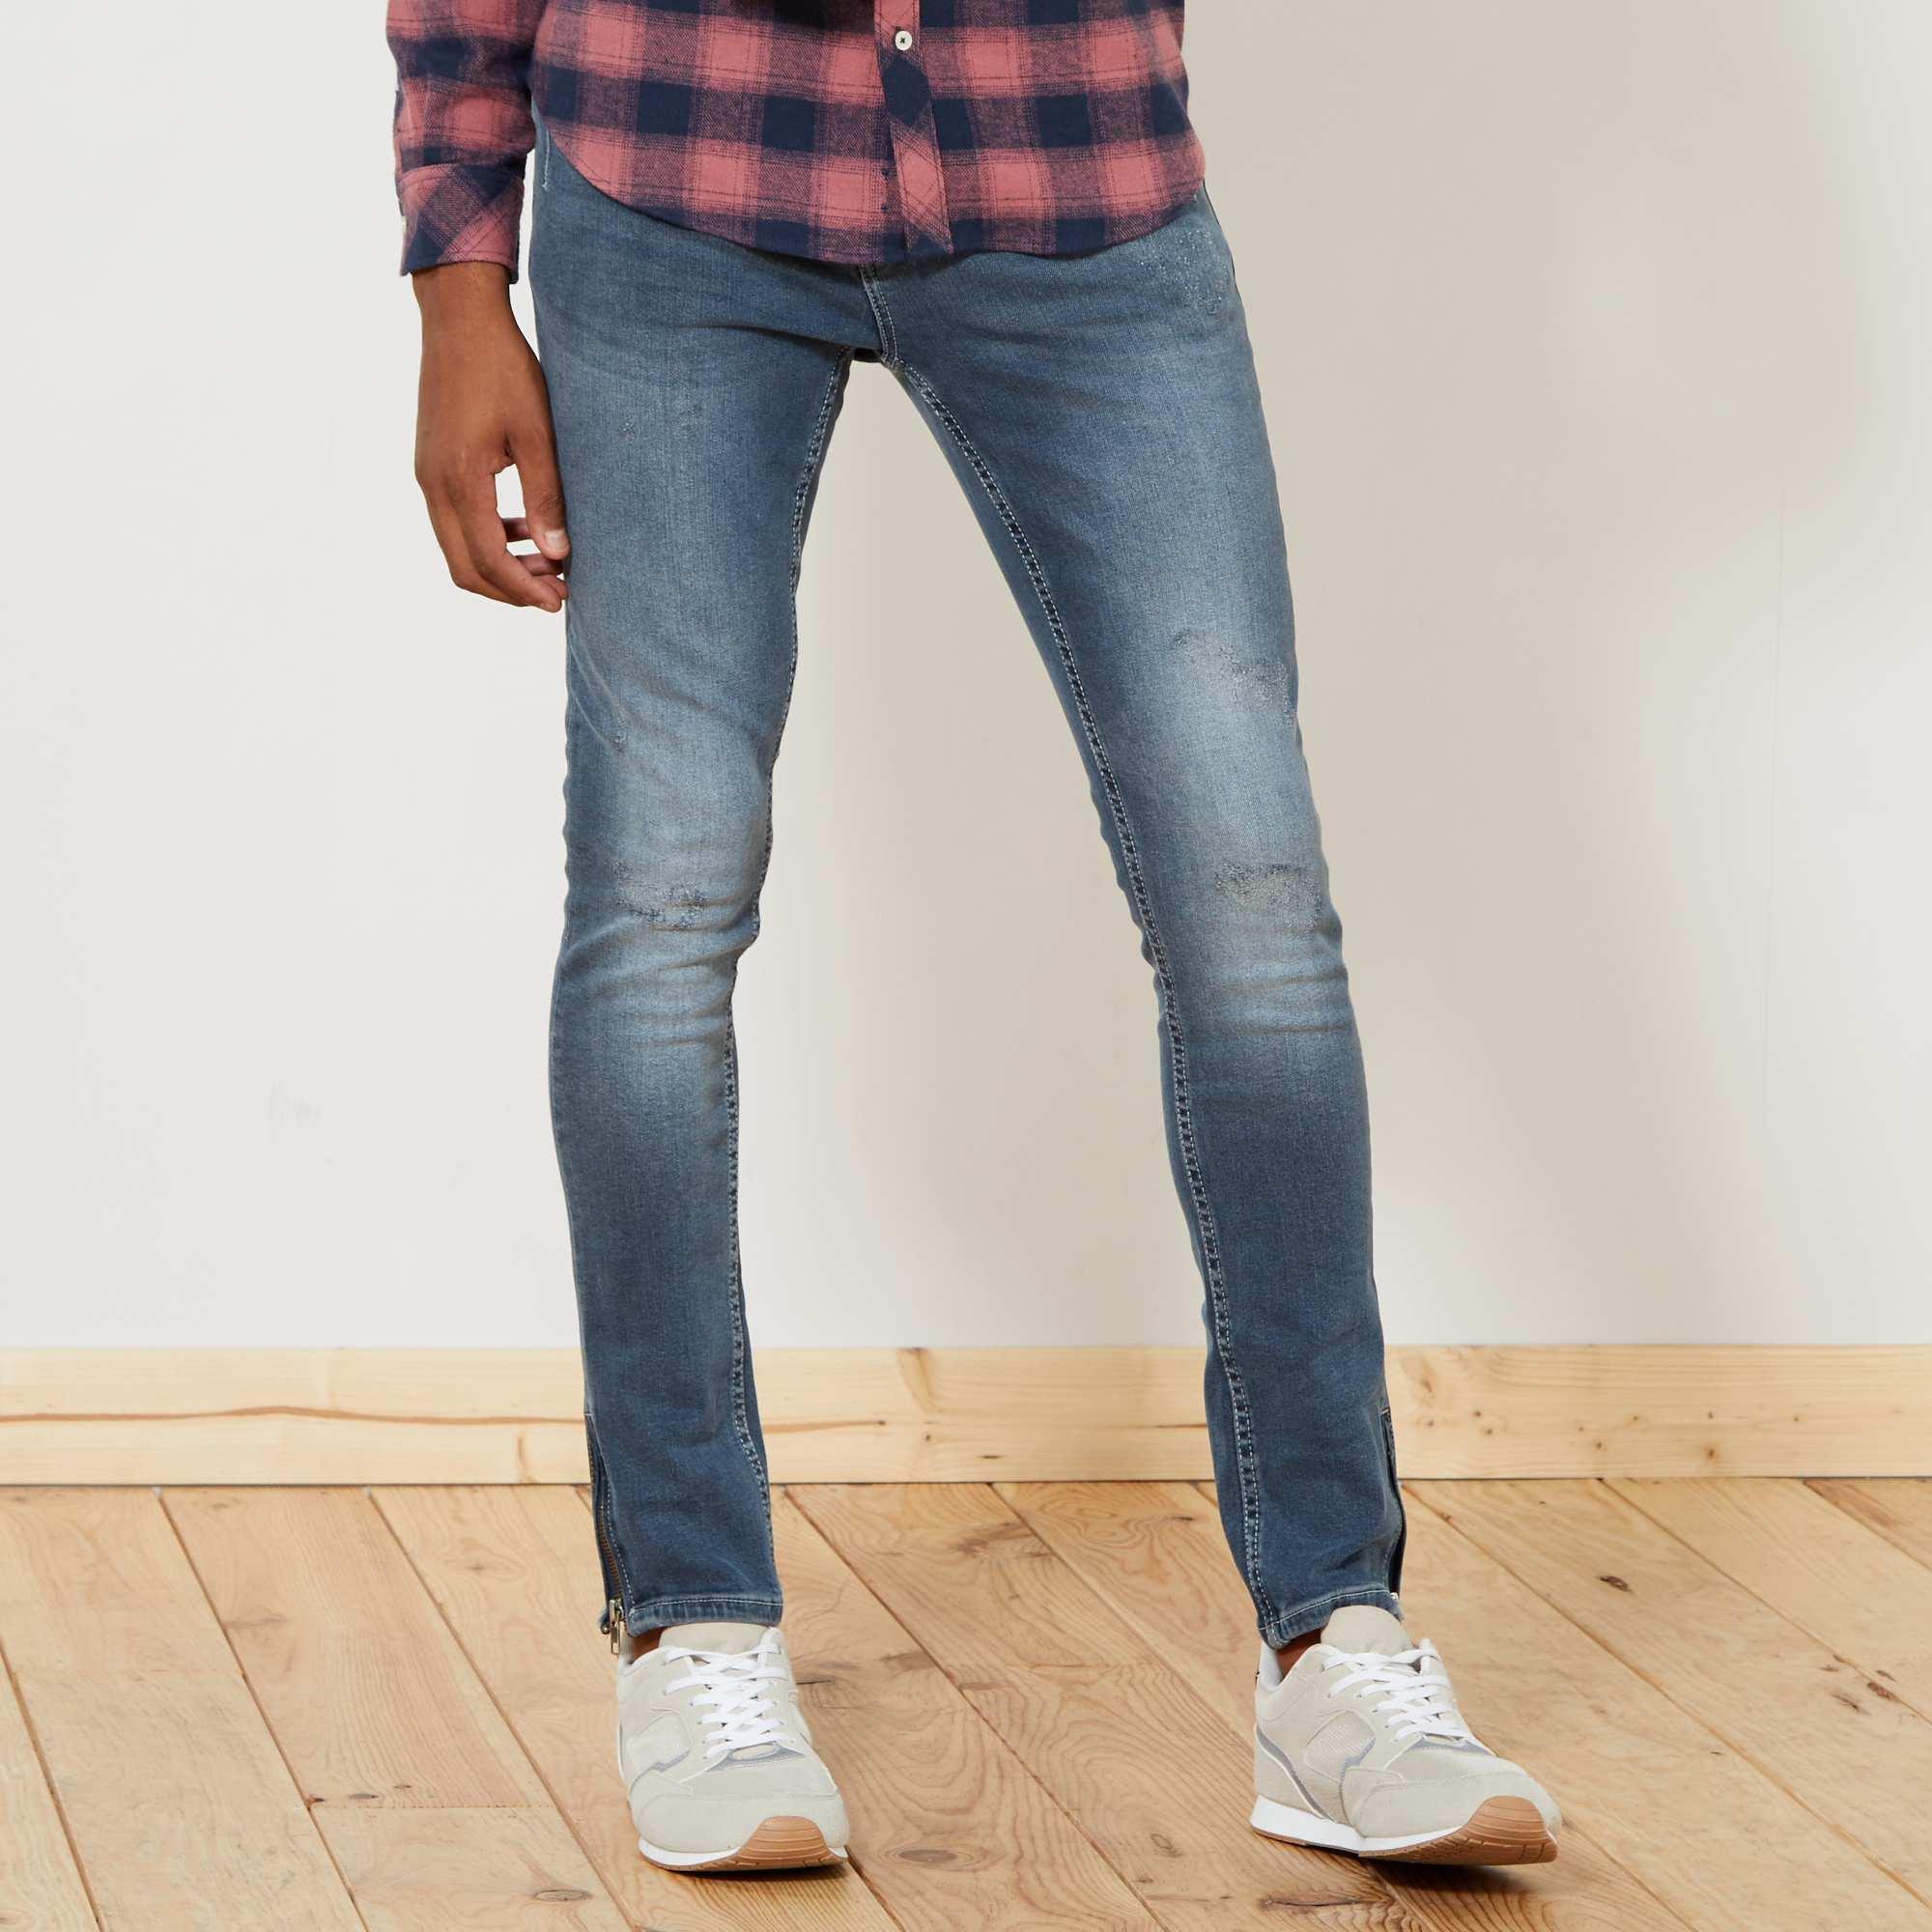 jean skinny bas de jambes zipp s homme bleu gris kiabi. Black Bedroom Furniture Sets. Home Design Ideas